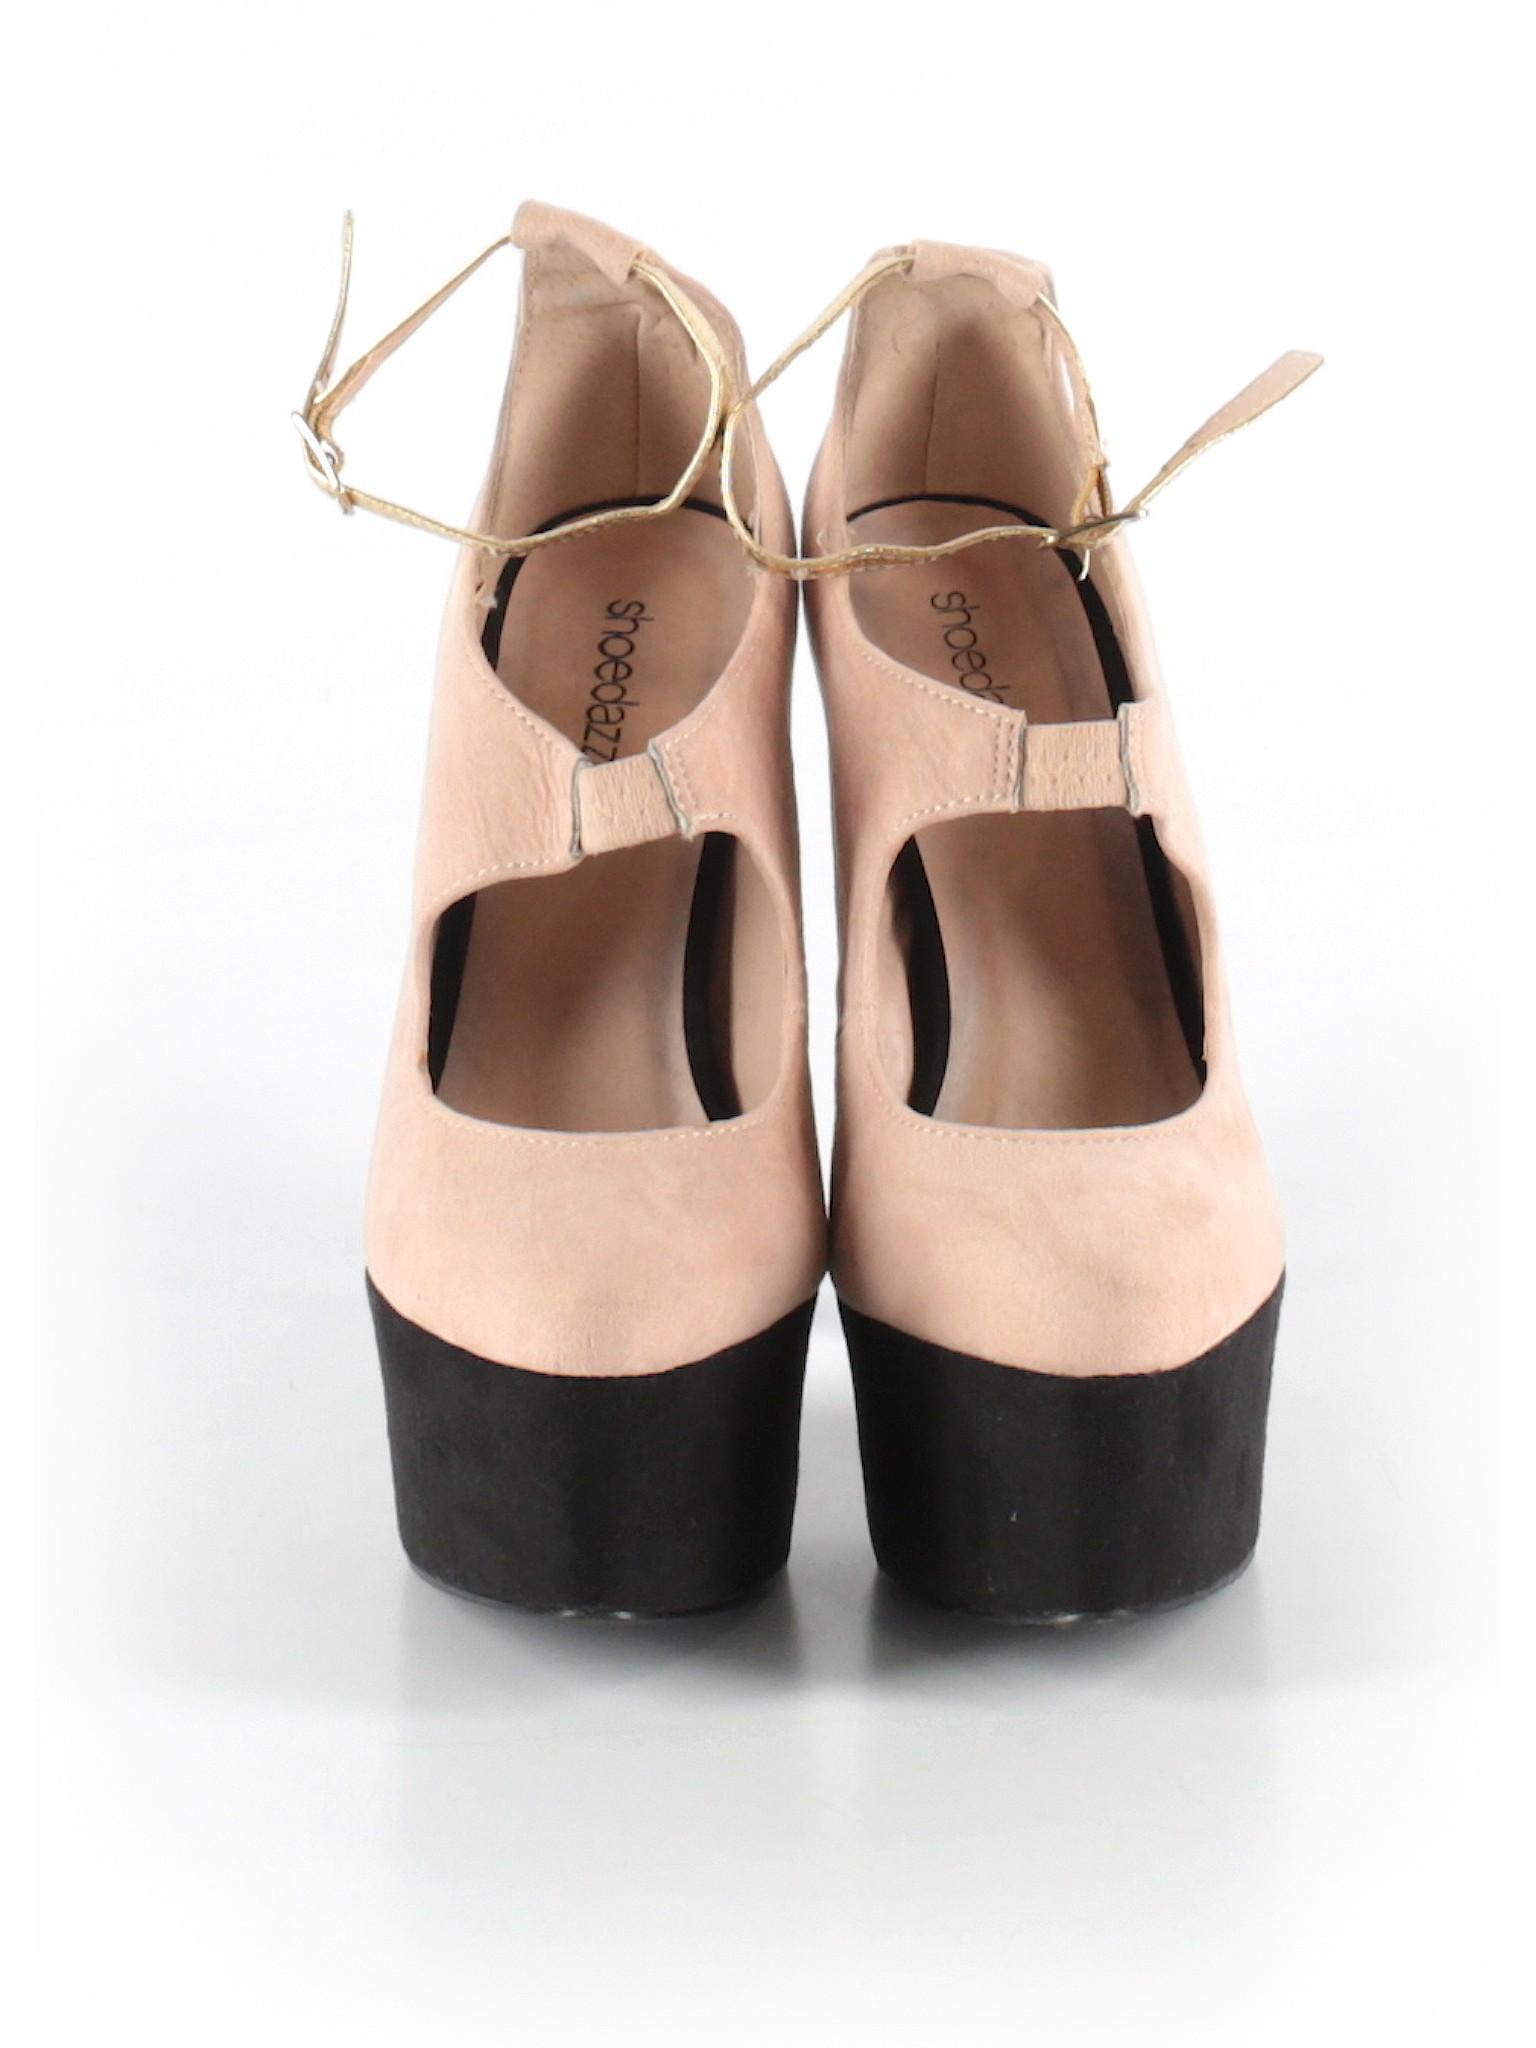 Shoedazzle promotion promotion Heels Shoedazzle Boutique promotion Boutique Boutique Heels qgg4ZS